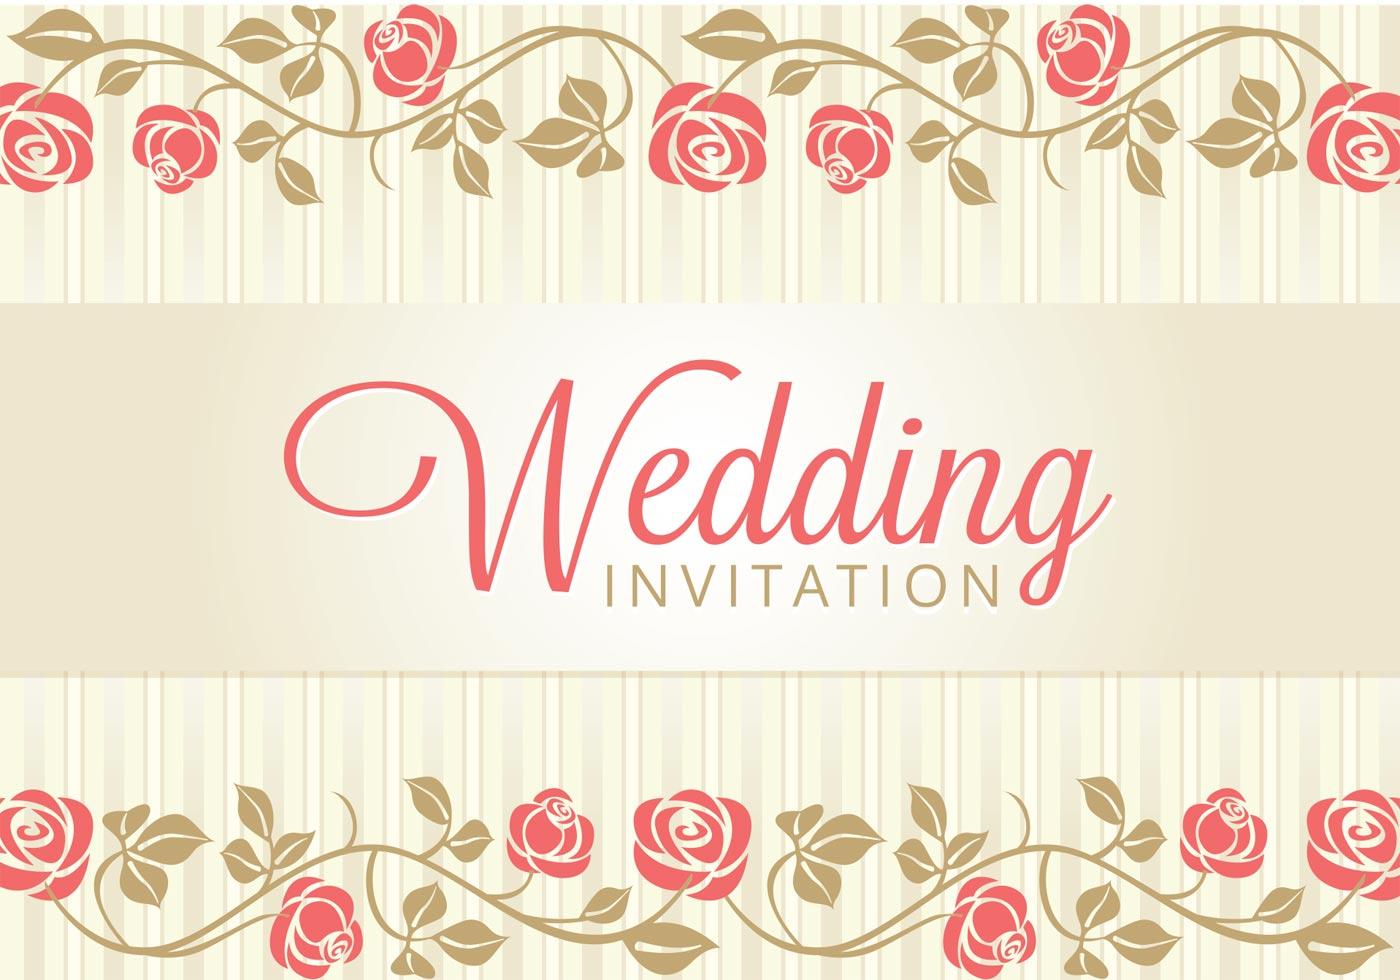 1400x980 Wedding Invitation Free Vector Art